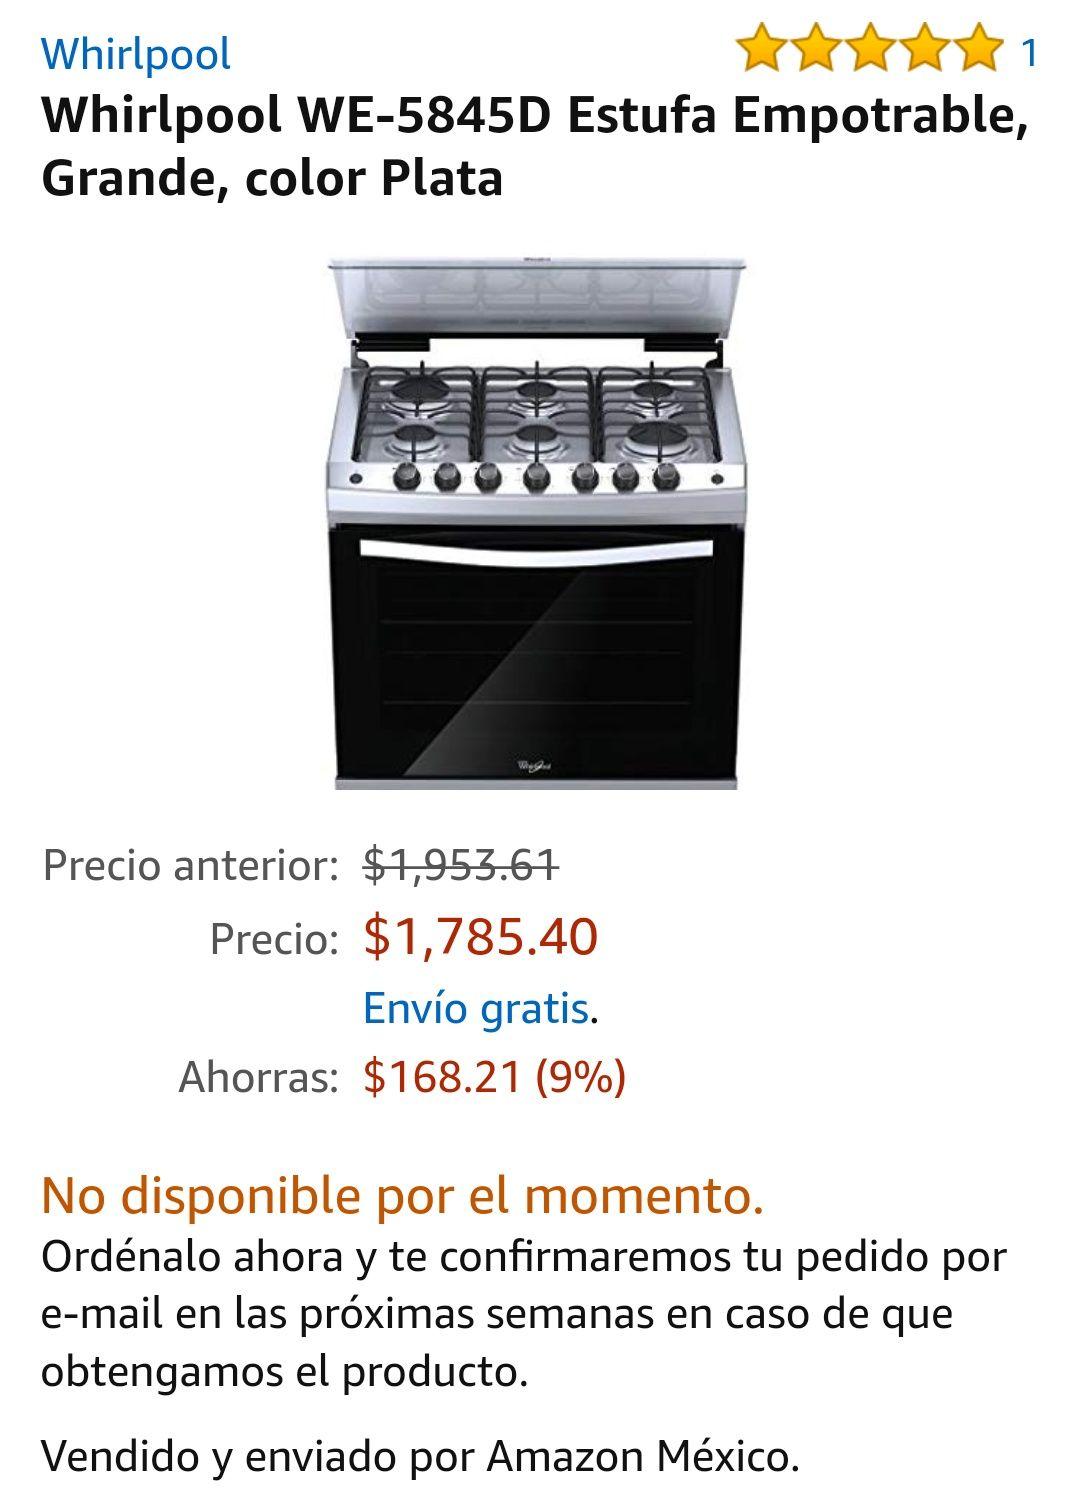 Amazon: UNICORNIO Estufa Whirlpool (en caso de que les lleguen)